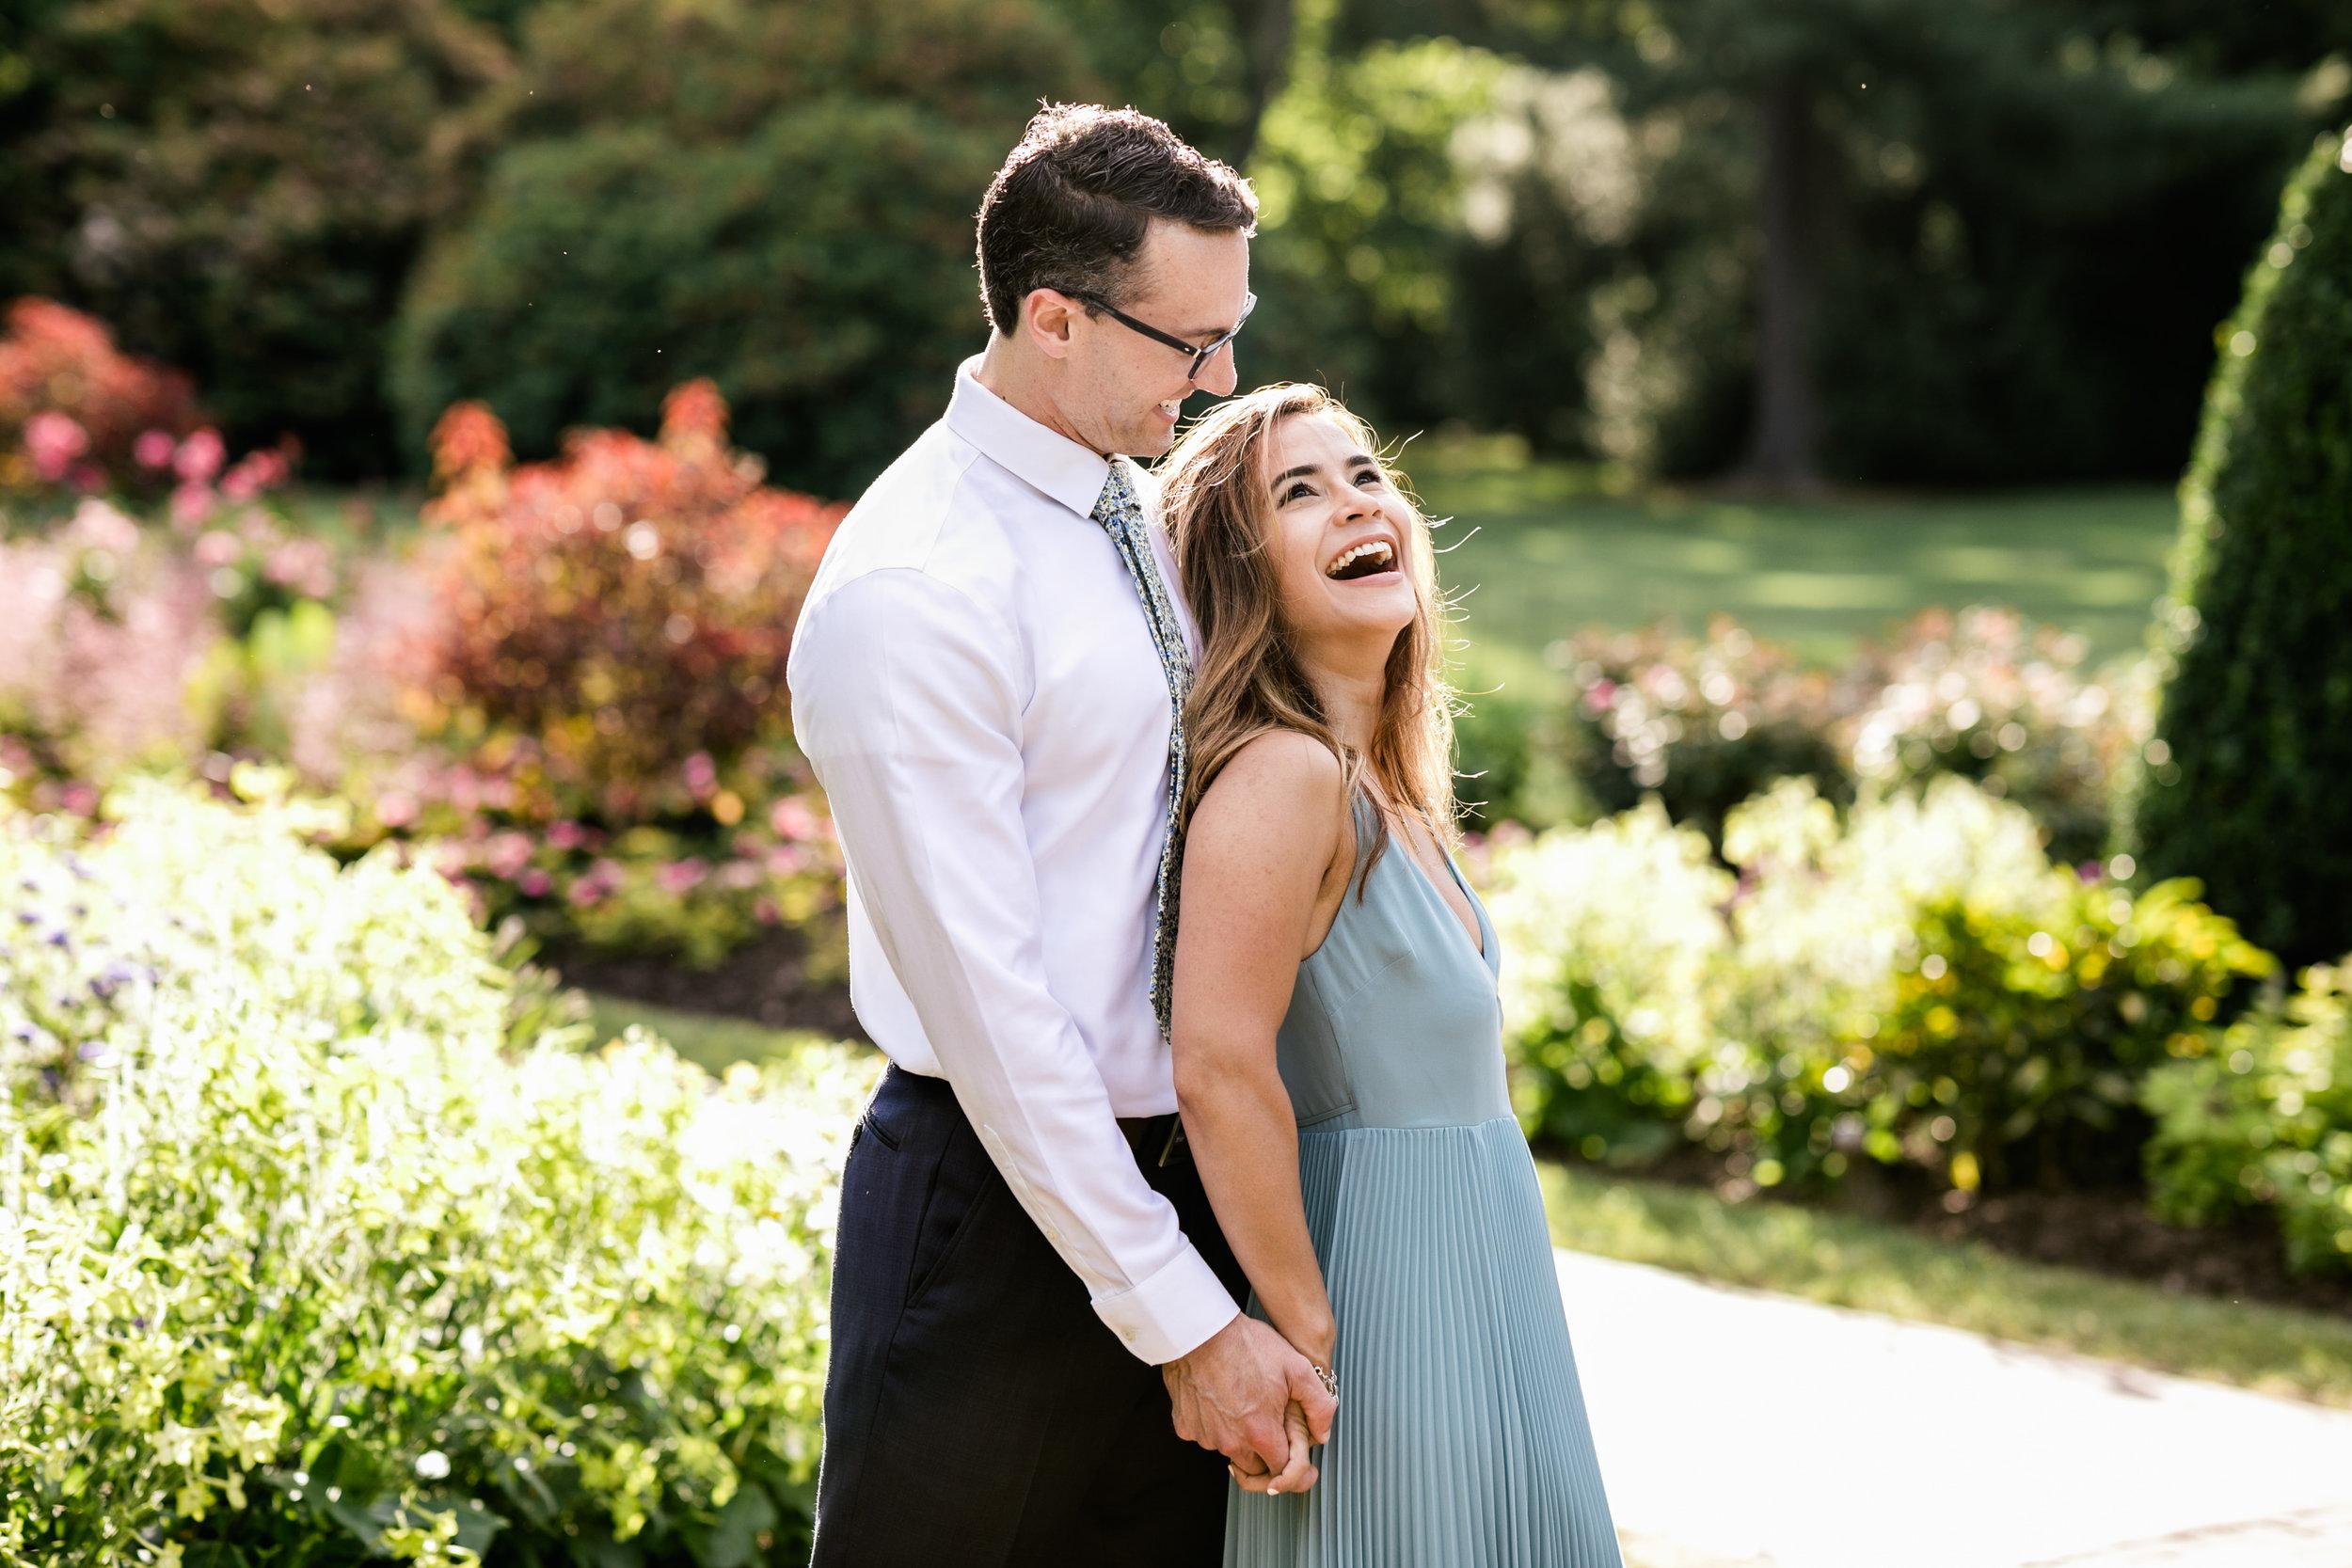 photography-natural-candid-engaged-proposal-philadelphia-wedding-longwood gardends-nature-flowers-modern-lifestyle-16.JPG